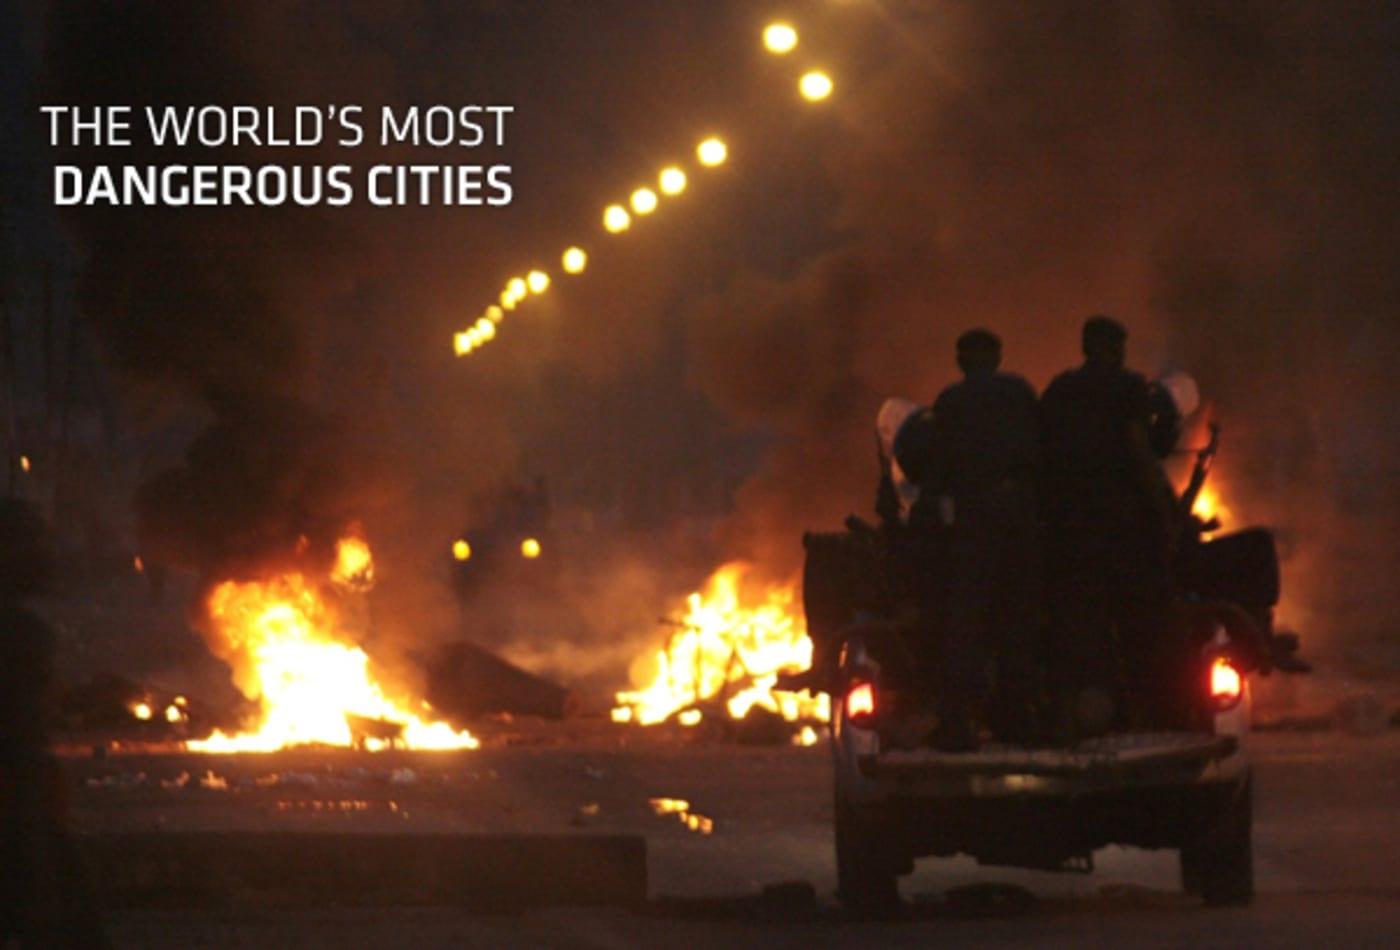 Dang-Cities-Intro.jpg